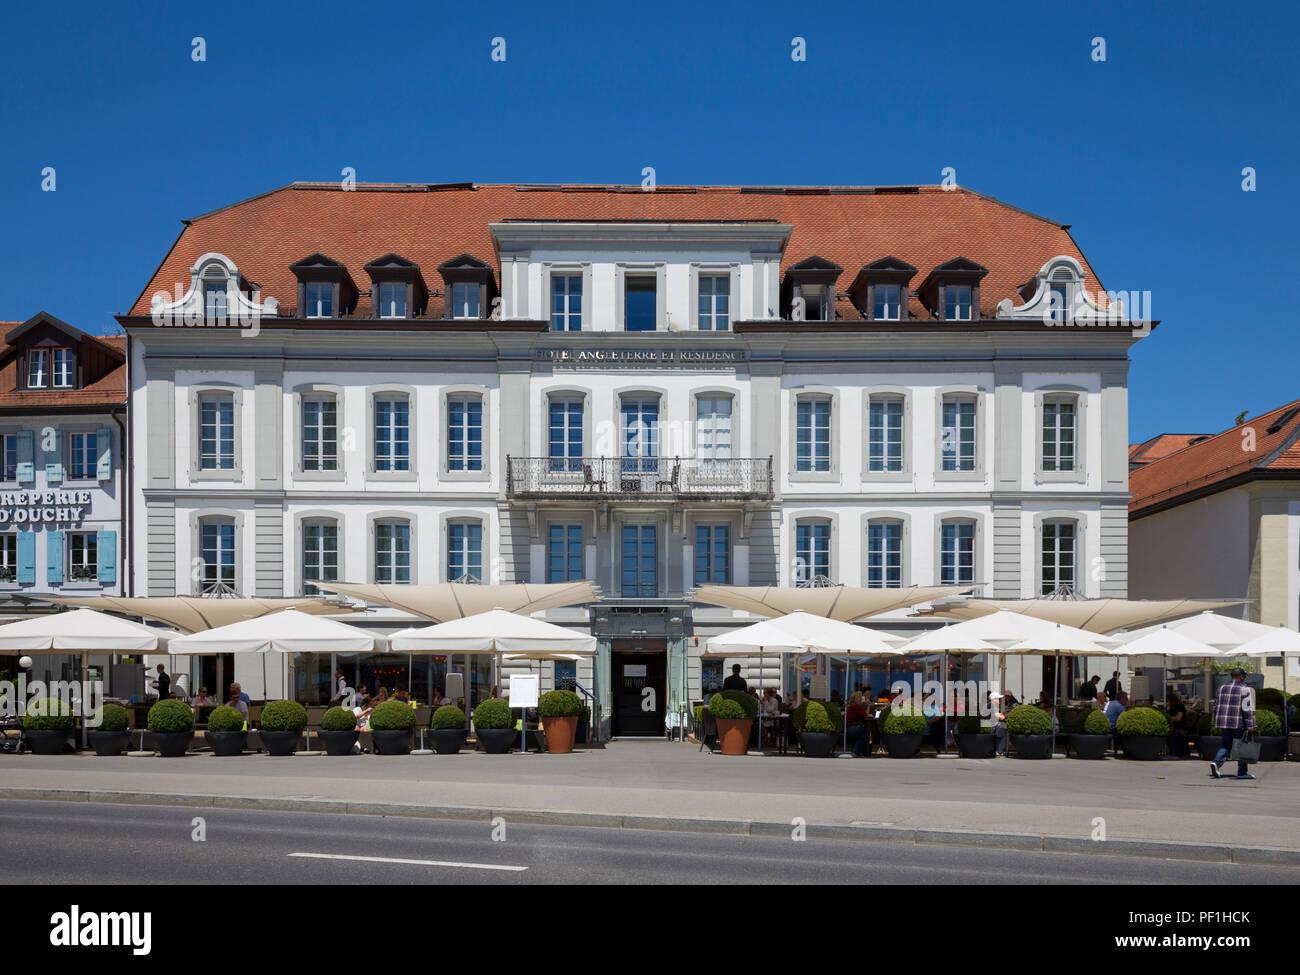 Angleterre & Residence Hotel, Place du Port, Lausanne, Switzerland - Stock Image